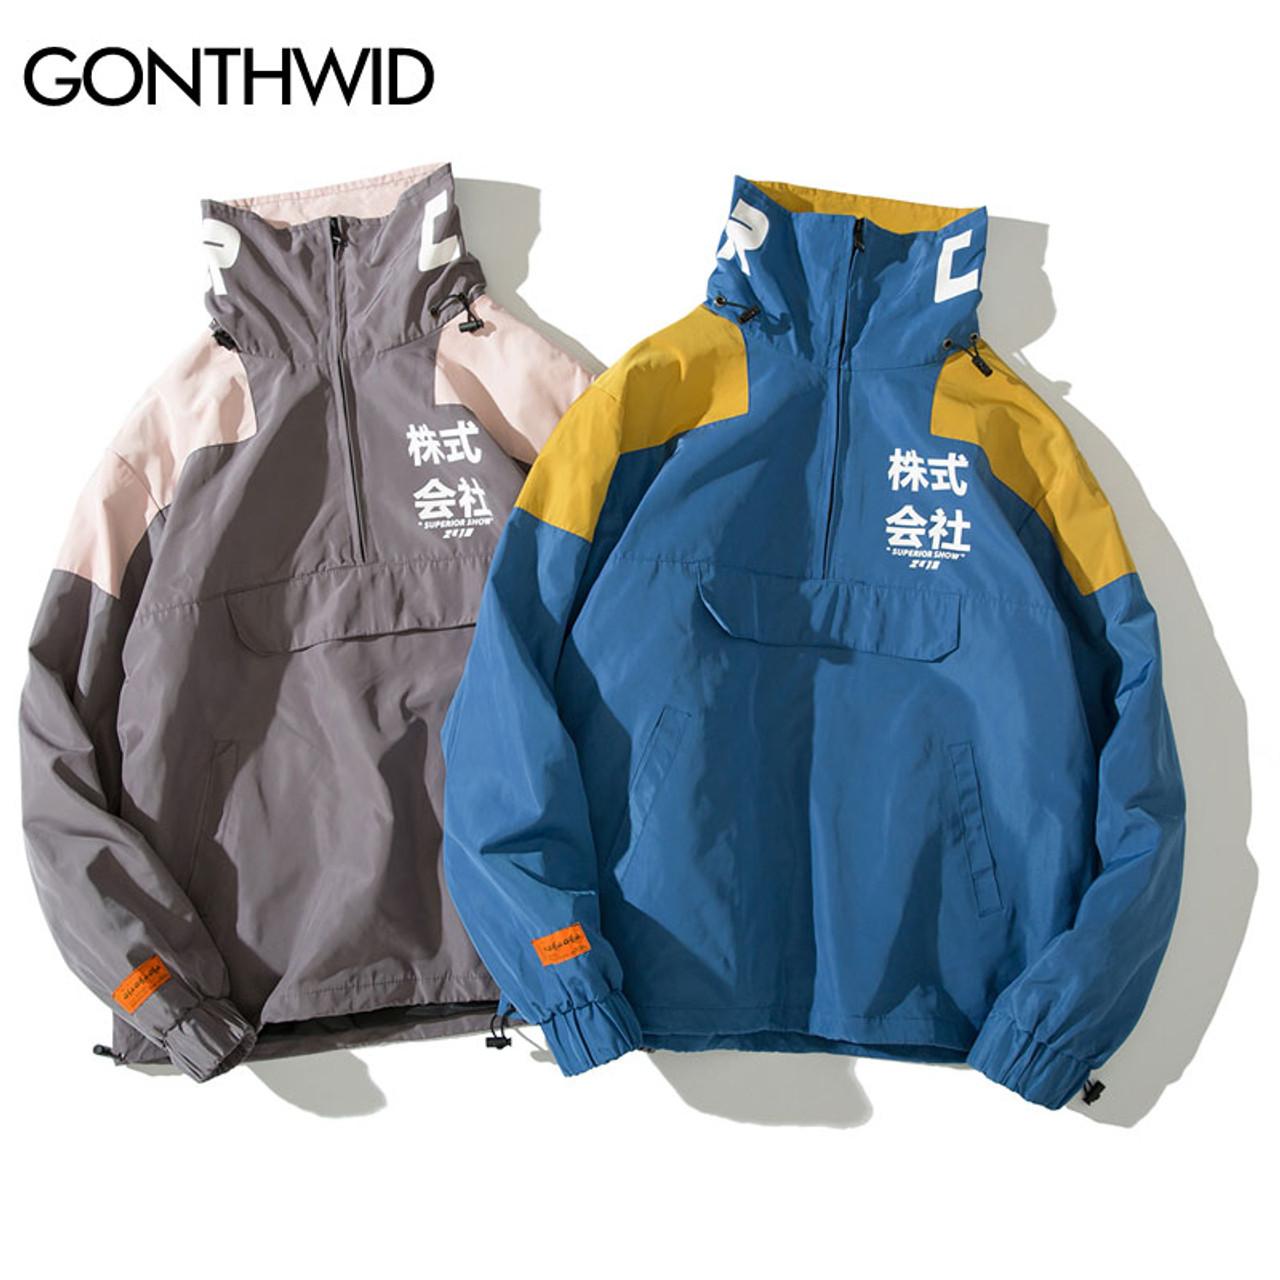 c1755c5734e ... GONTHWID Back Pockets Half Zipper Pullover Windbreaker Track Jackets  Men 2018 Autumn Hip Hop Harajuku Coats ...